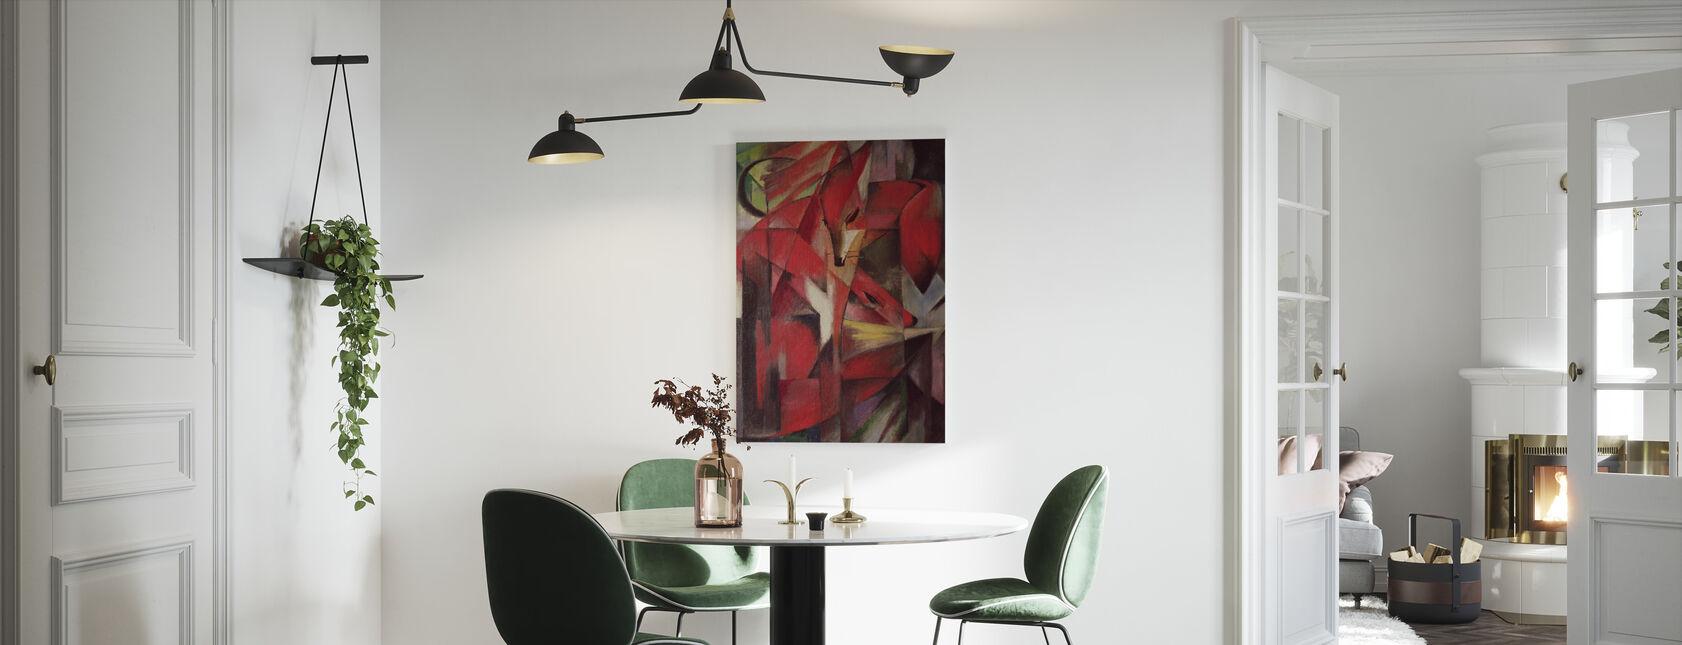 Foxes - Franz Marc - Canvas print - Kitchen